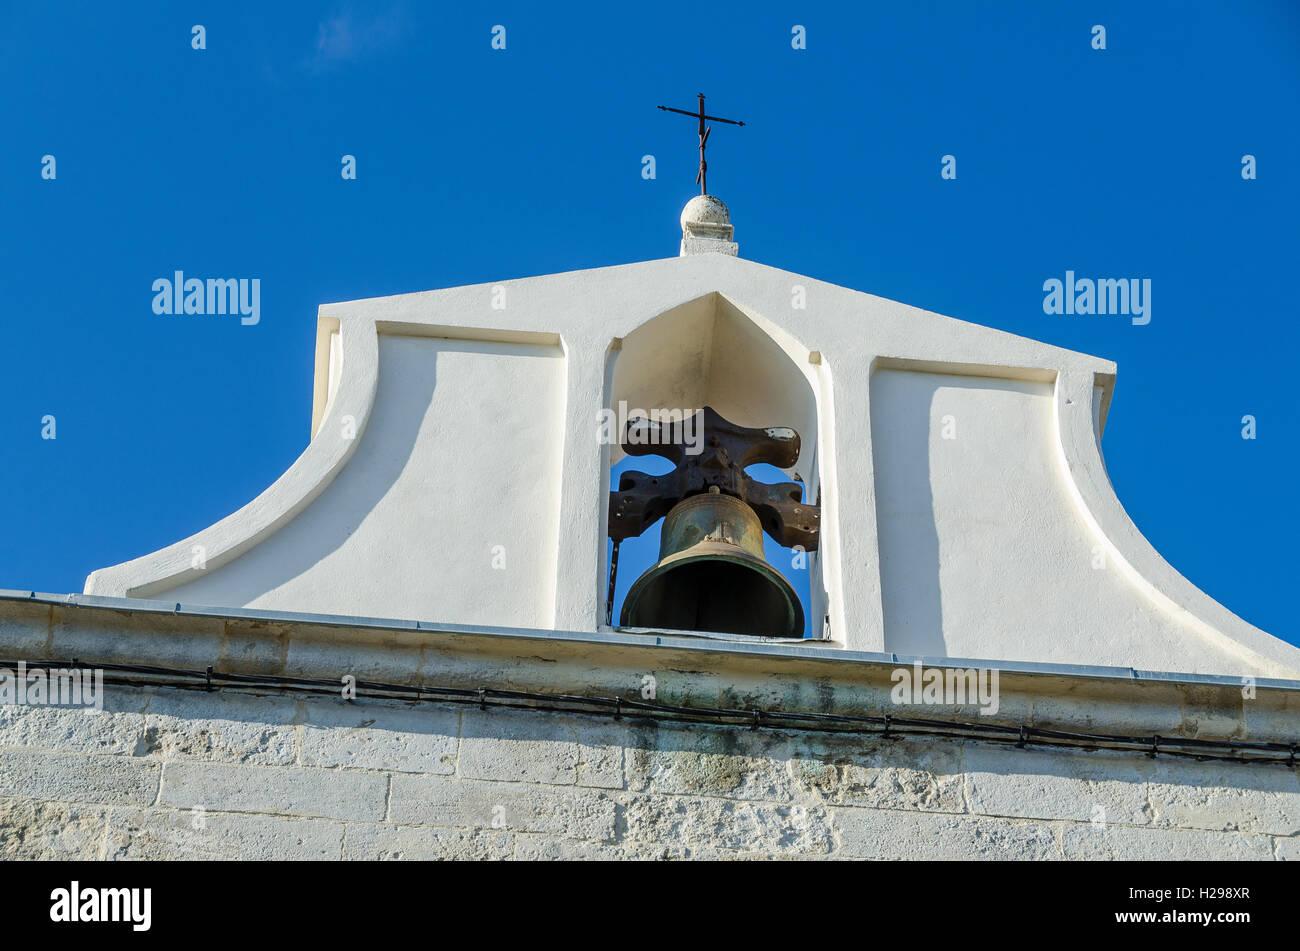 clocher, Aigues Mortes, Gard, Provence, France - Stock Image